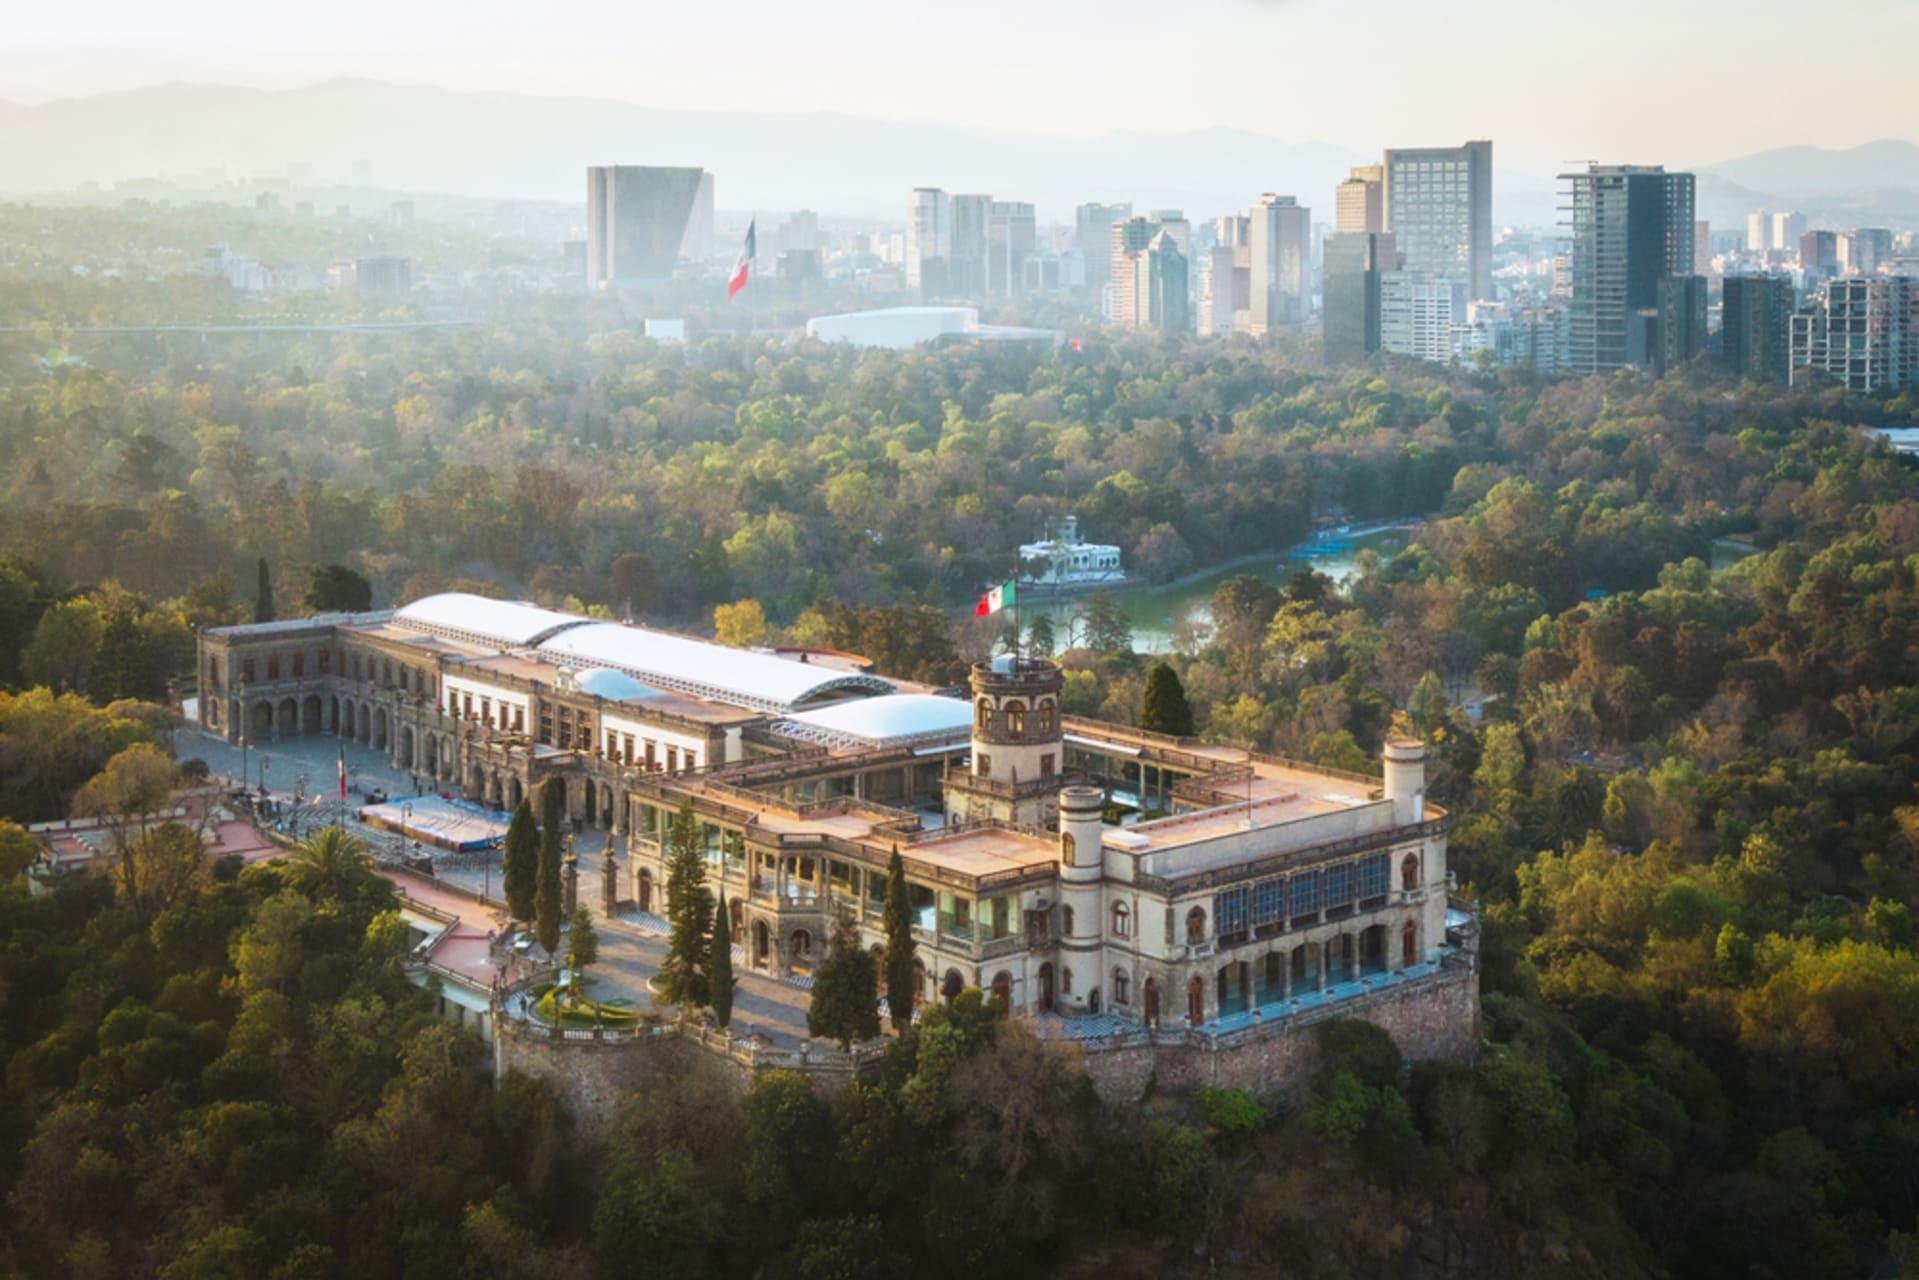 Mexico City - Chapultepec - the Lung of Mexico City